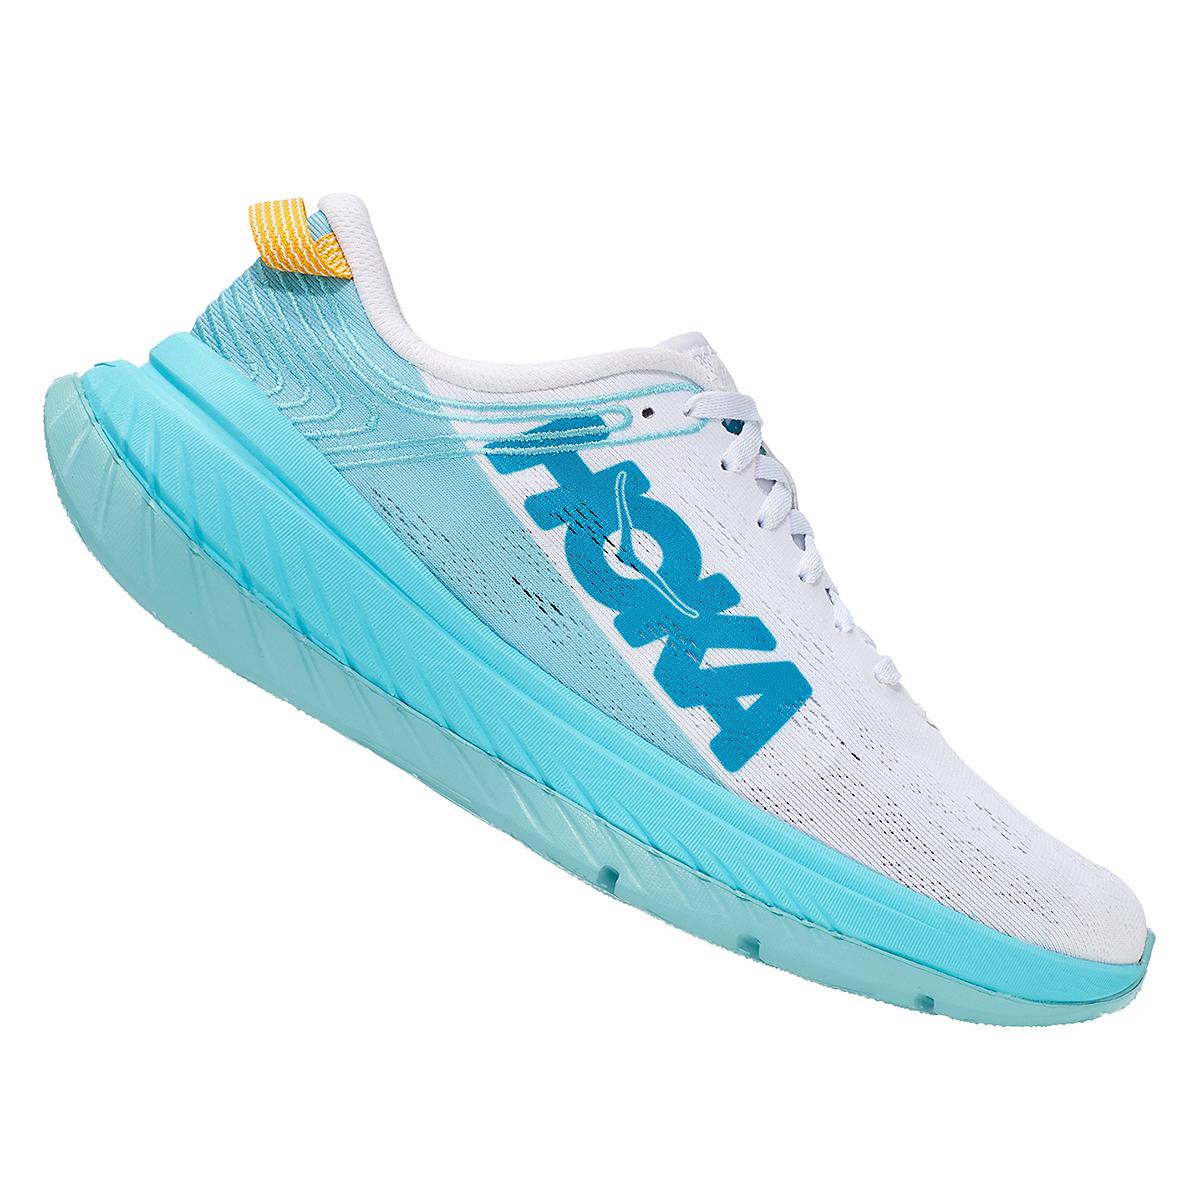 Women's Hoka One One Carbon X Running Shoe - Color: White/Angel Blue - Size: 5 - Width: Regular, White/Angel Blue, large, image 4